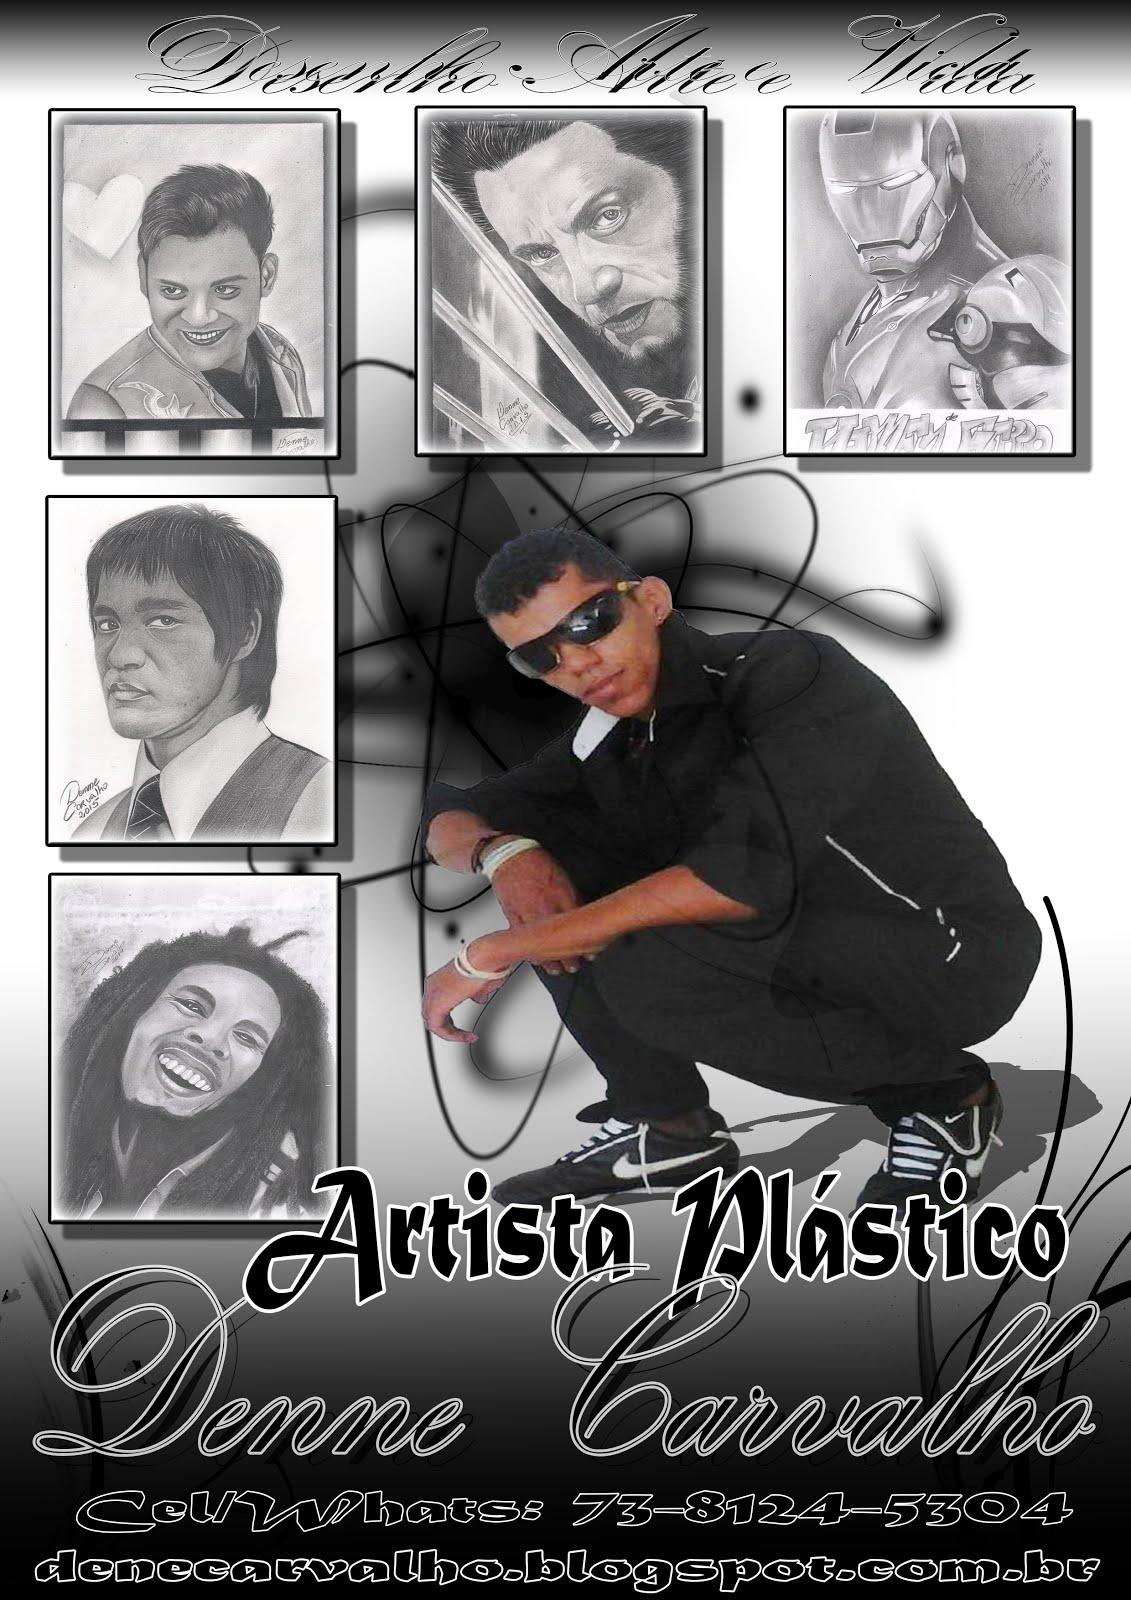 Artista Plástico